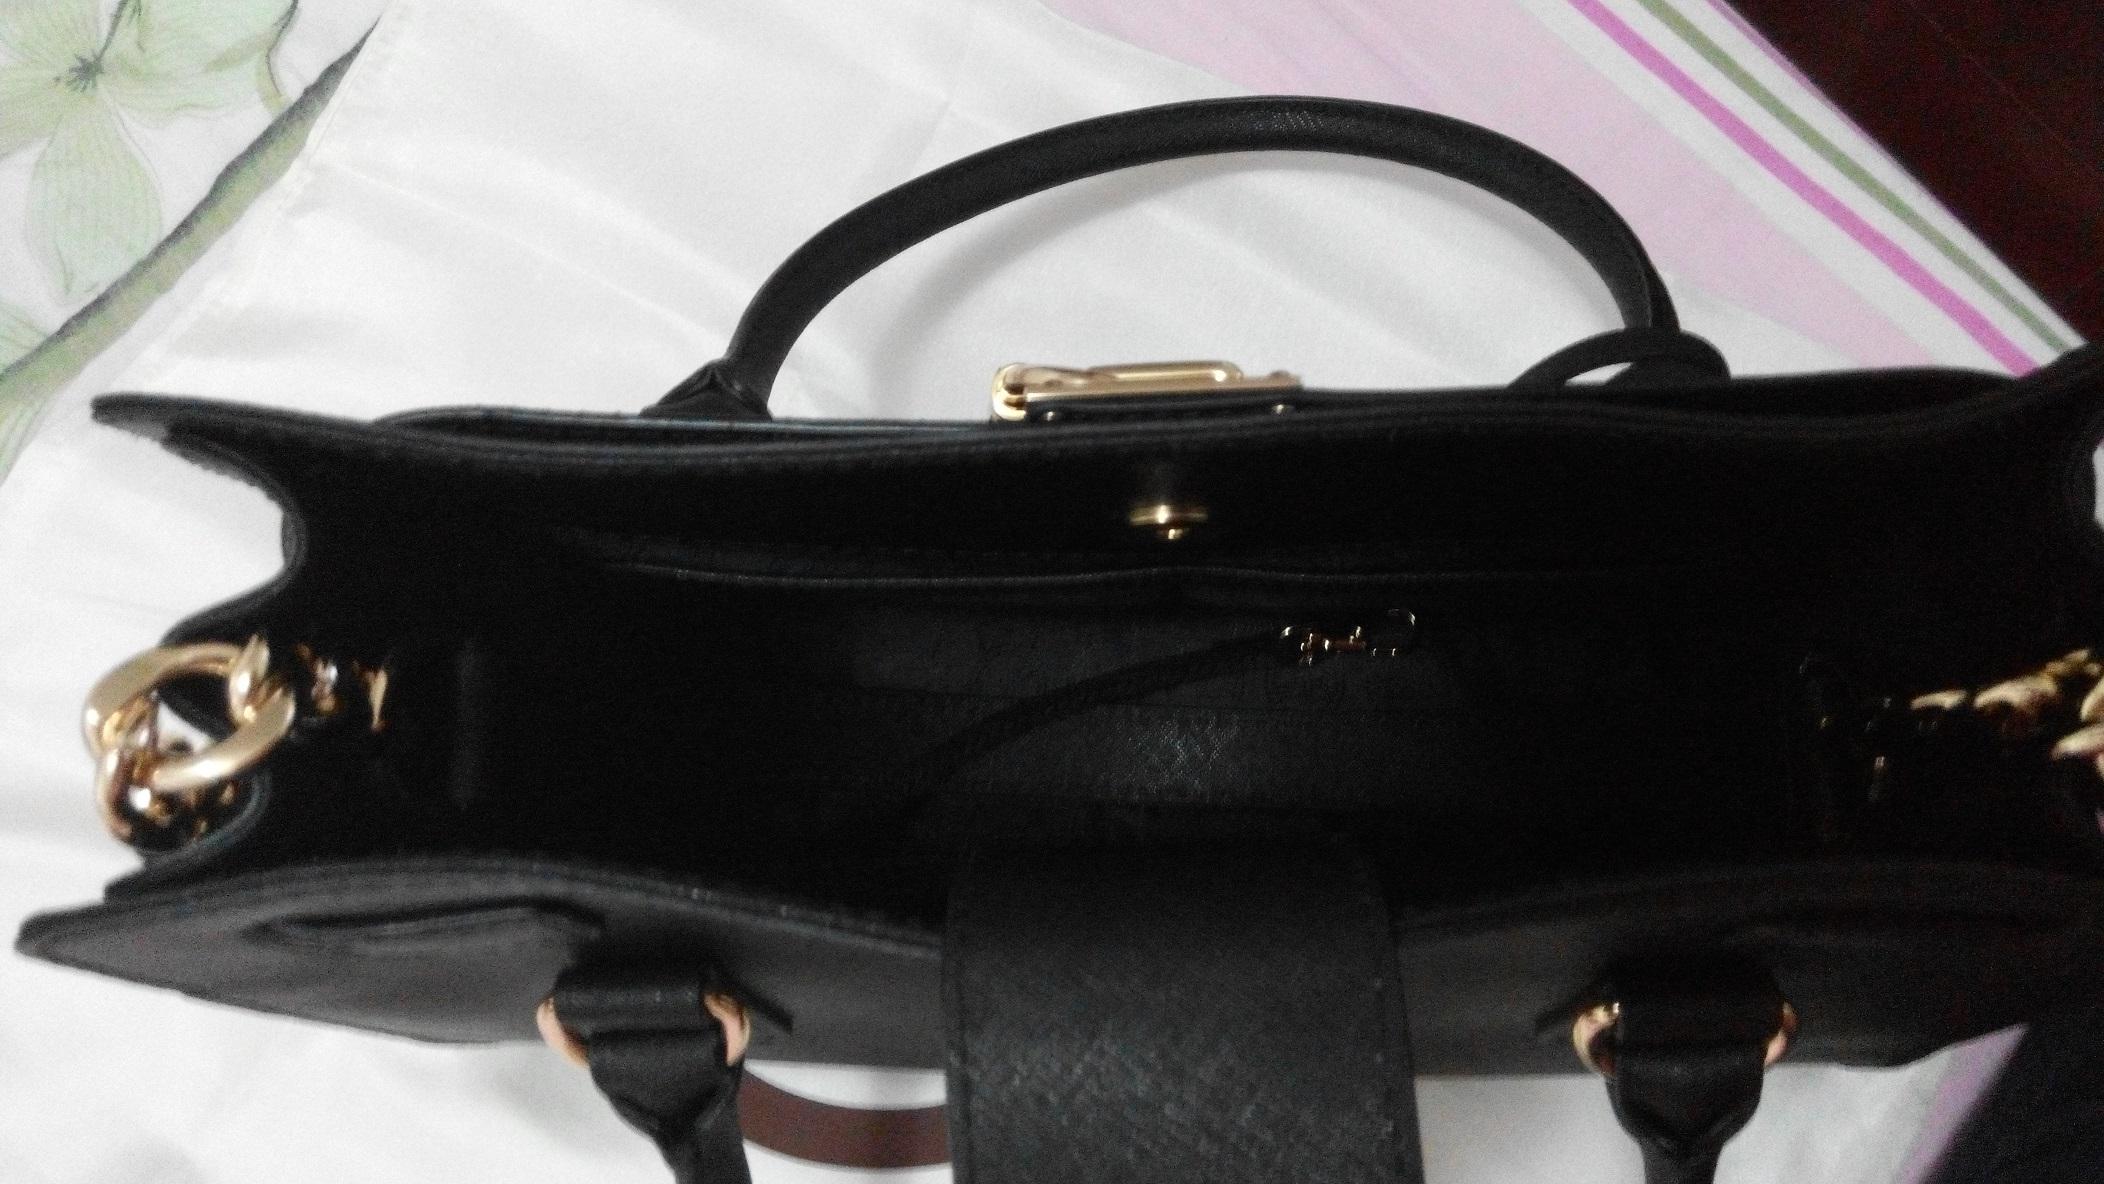 buy supra shoes nyc reviews 00268902 store